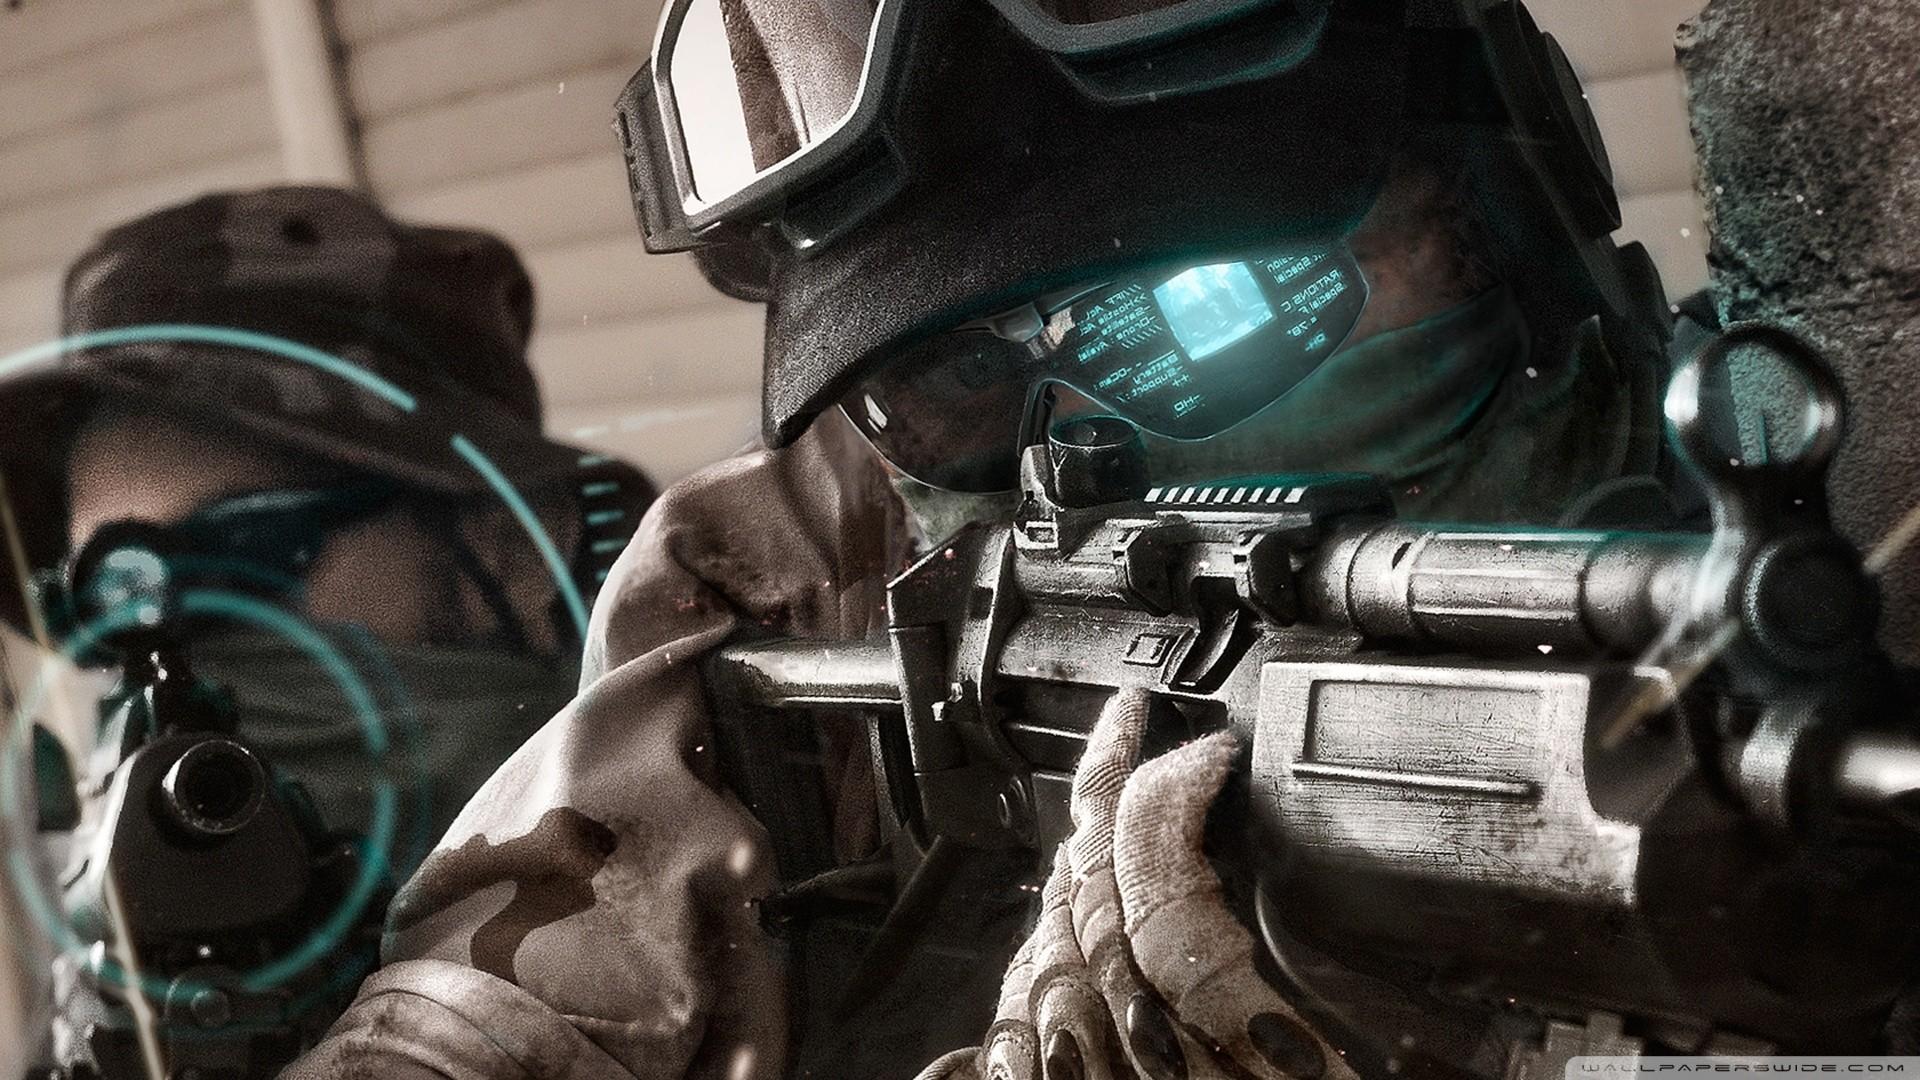 1920x1080 Ghost Recon Future Soldier HD desktop wallpaper High Definition